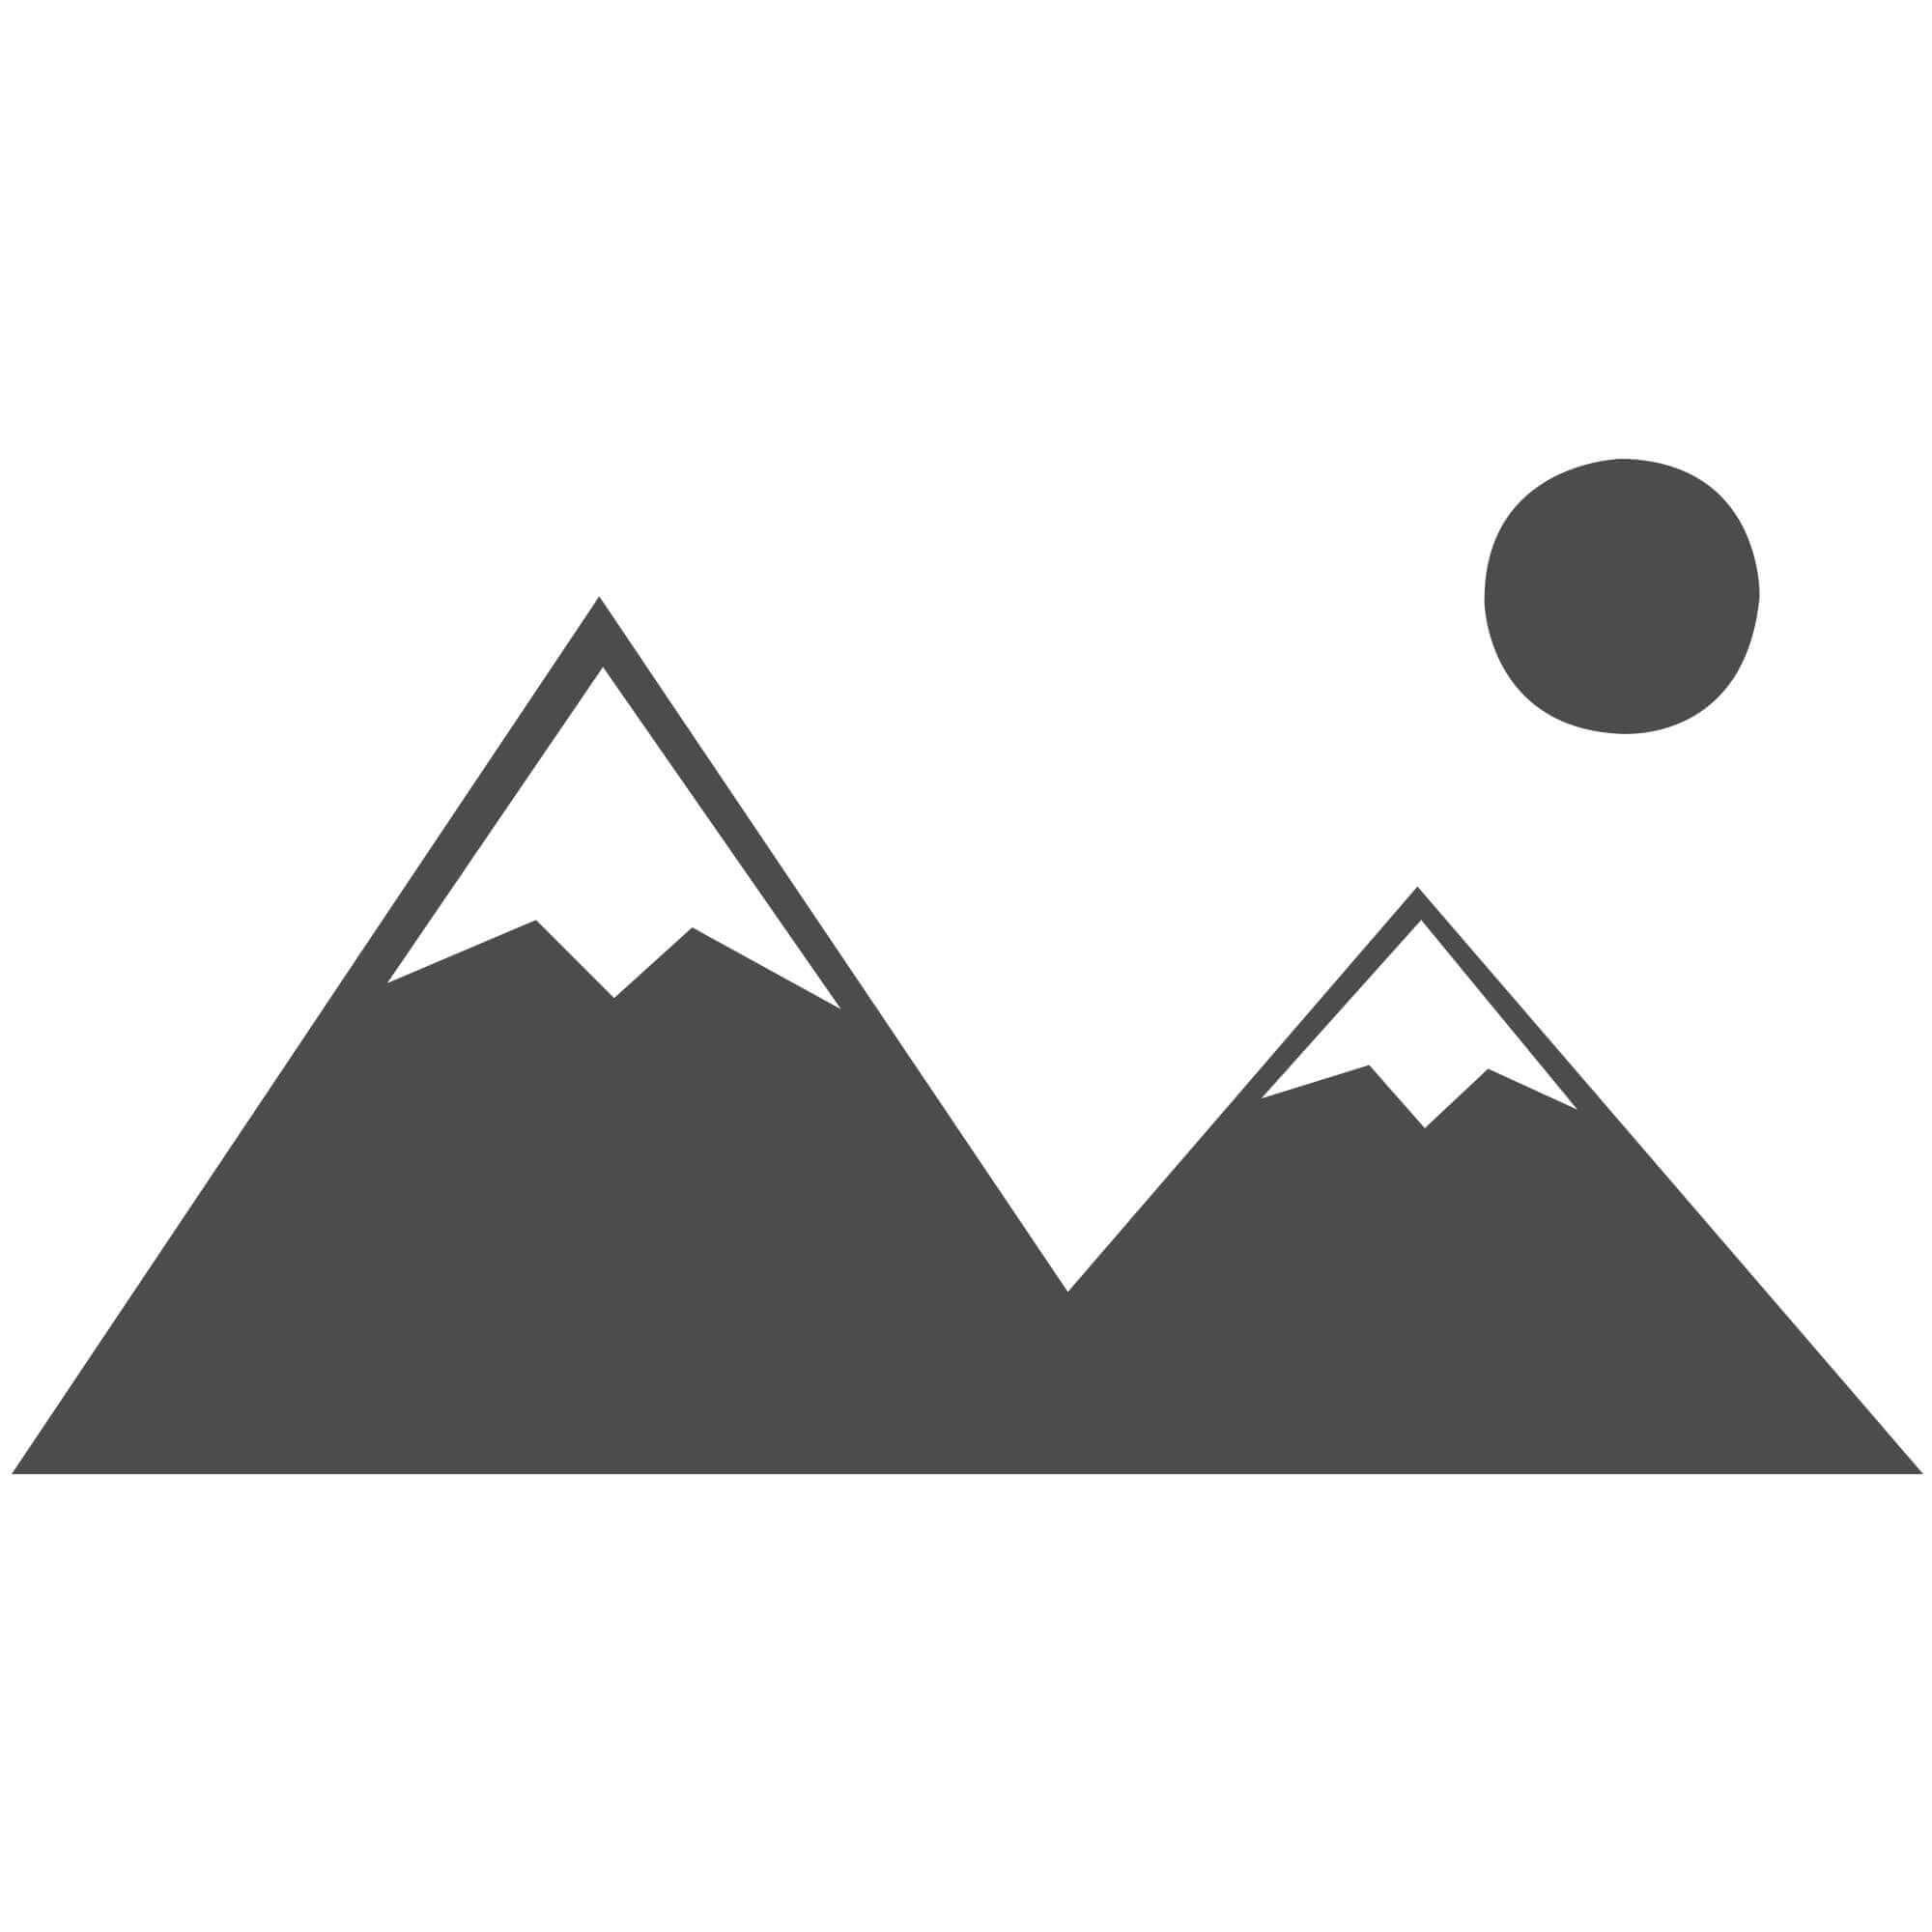 "Cascade Shaggy Rug - Powder White - Size 65 x 135 cm (2'2"" x 4'5"")"